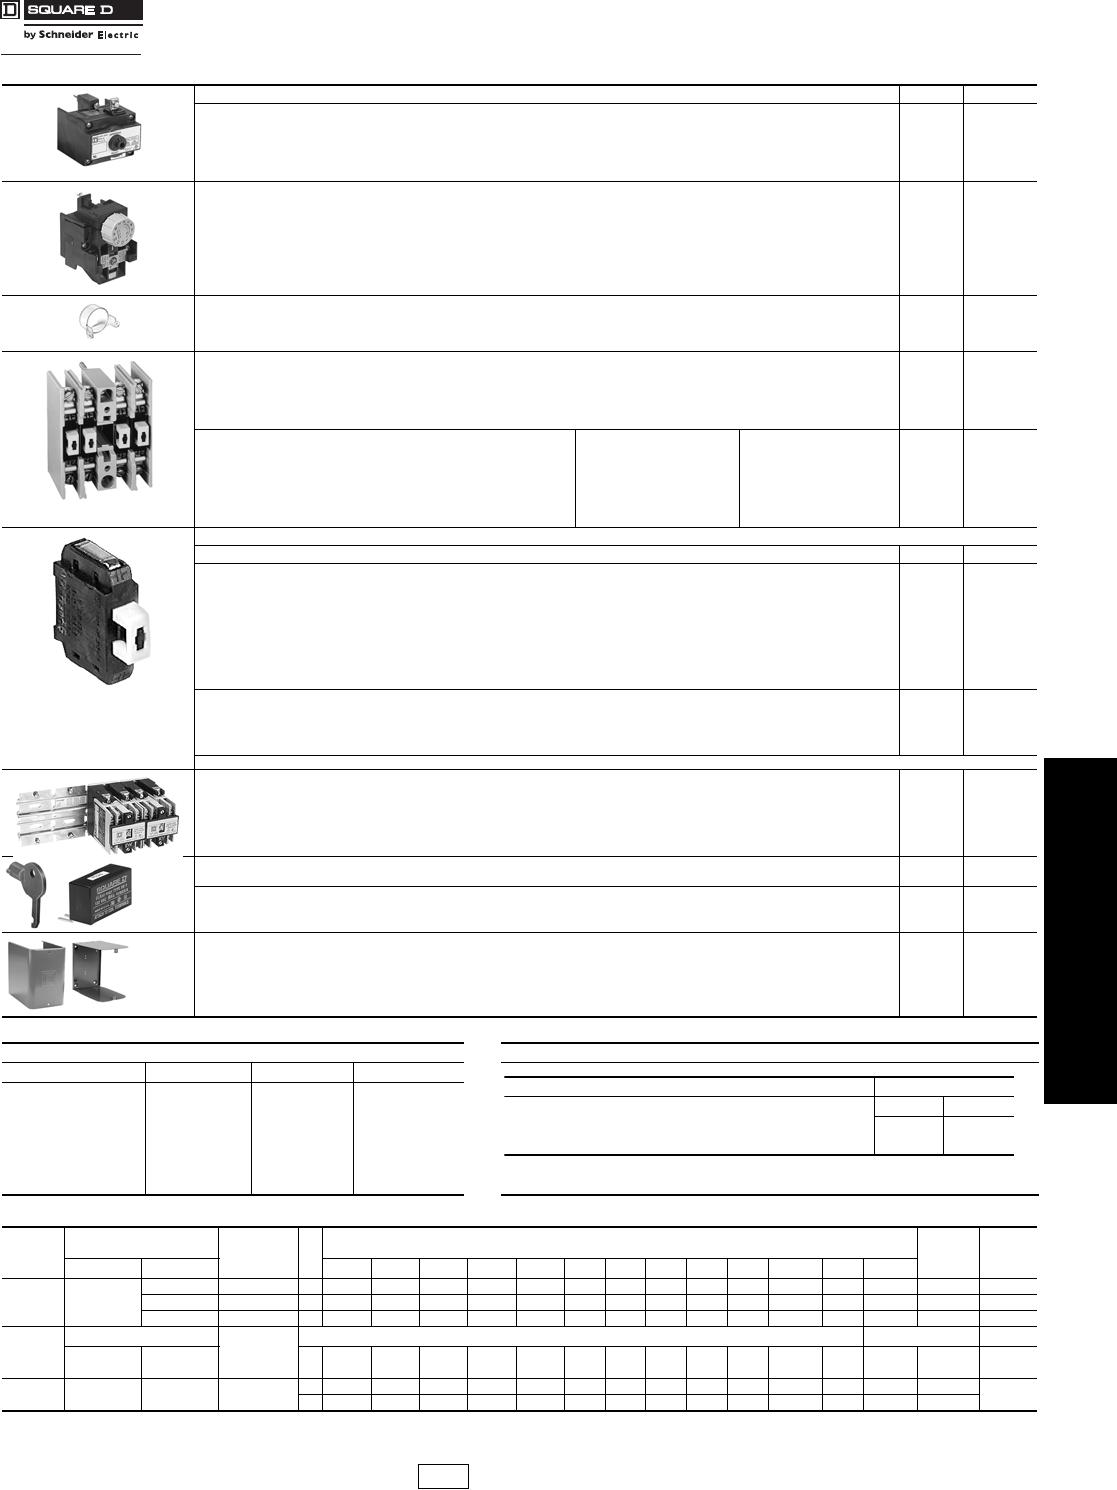 17523 Ab Alternating Relay Wiring Diagram Schneider Electricus